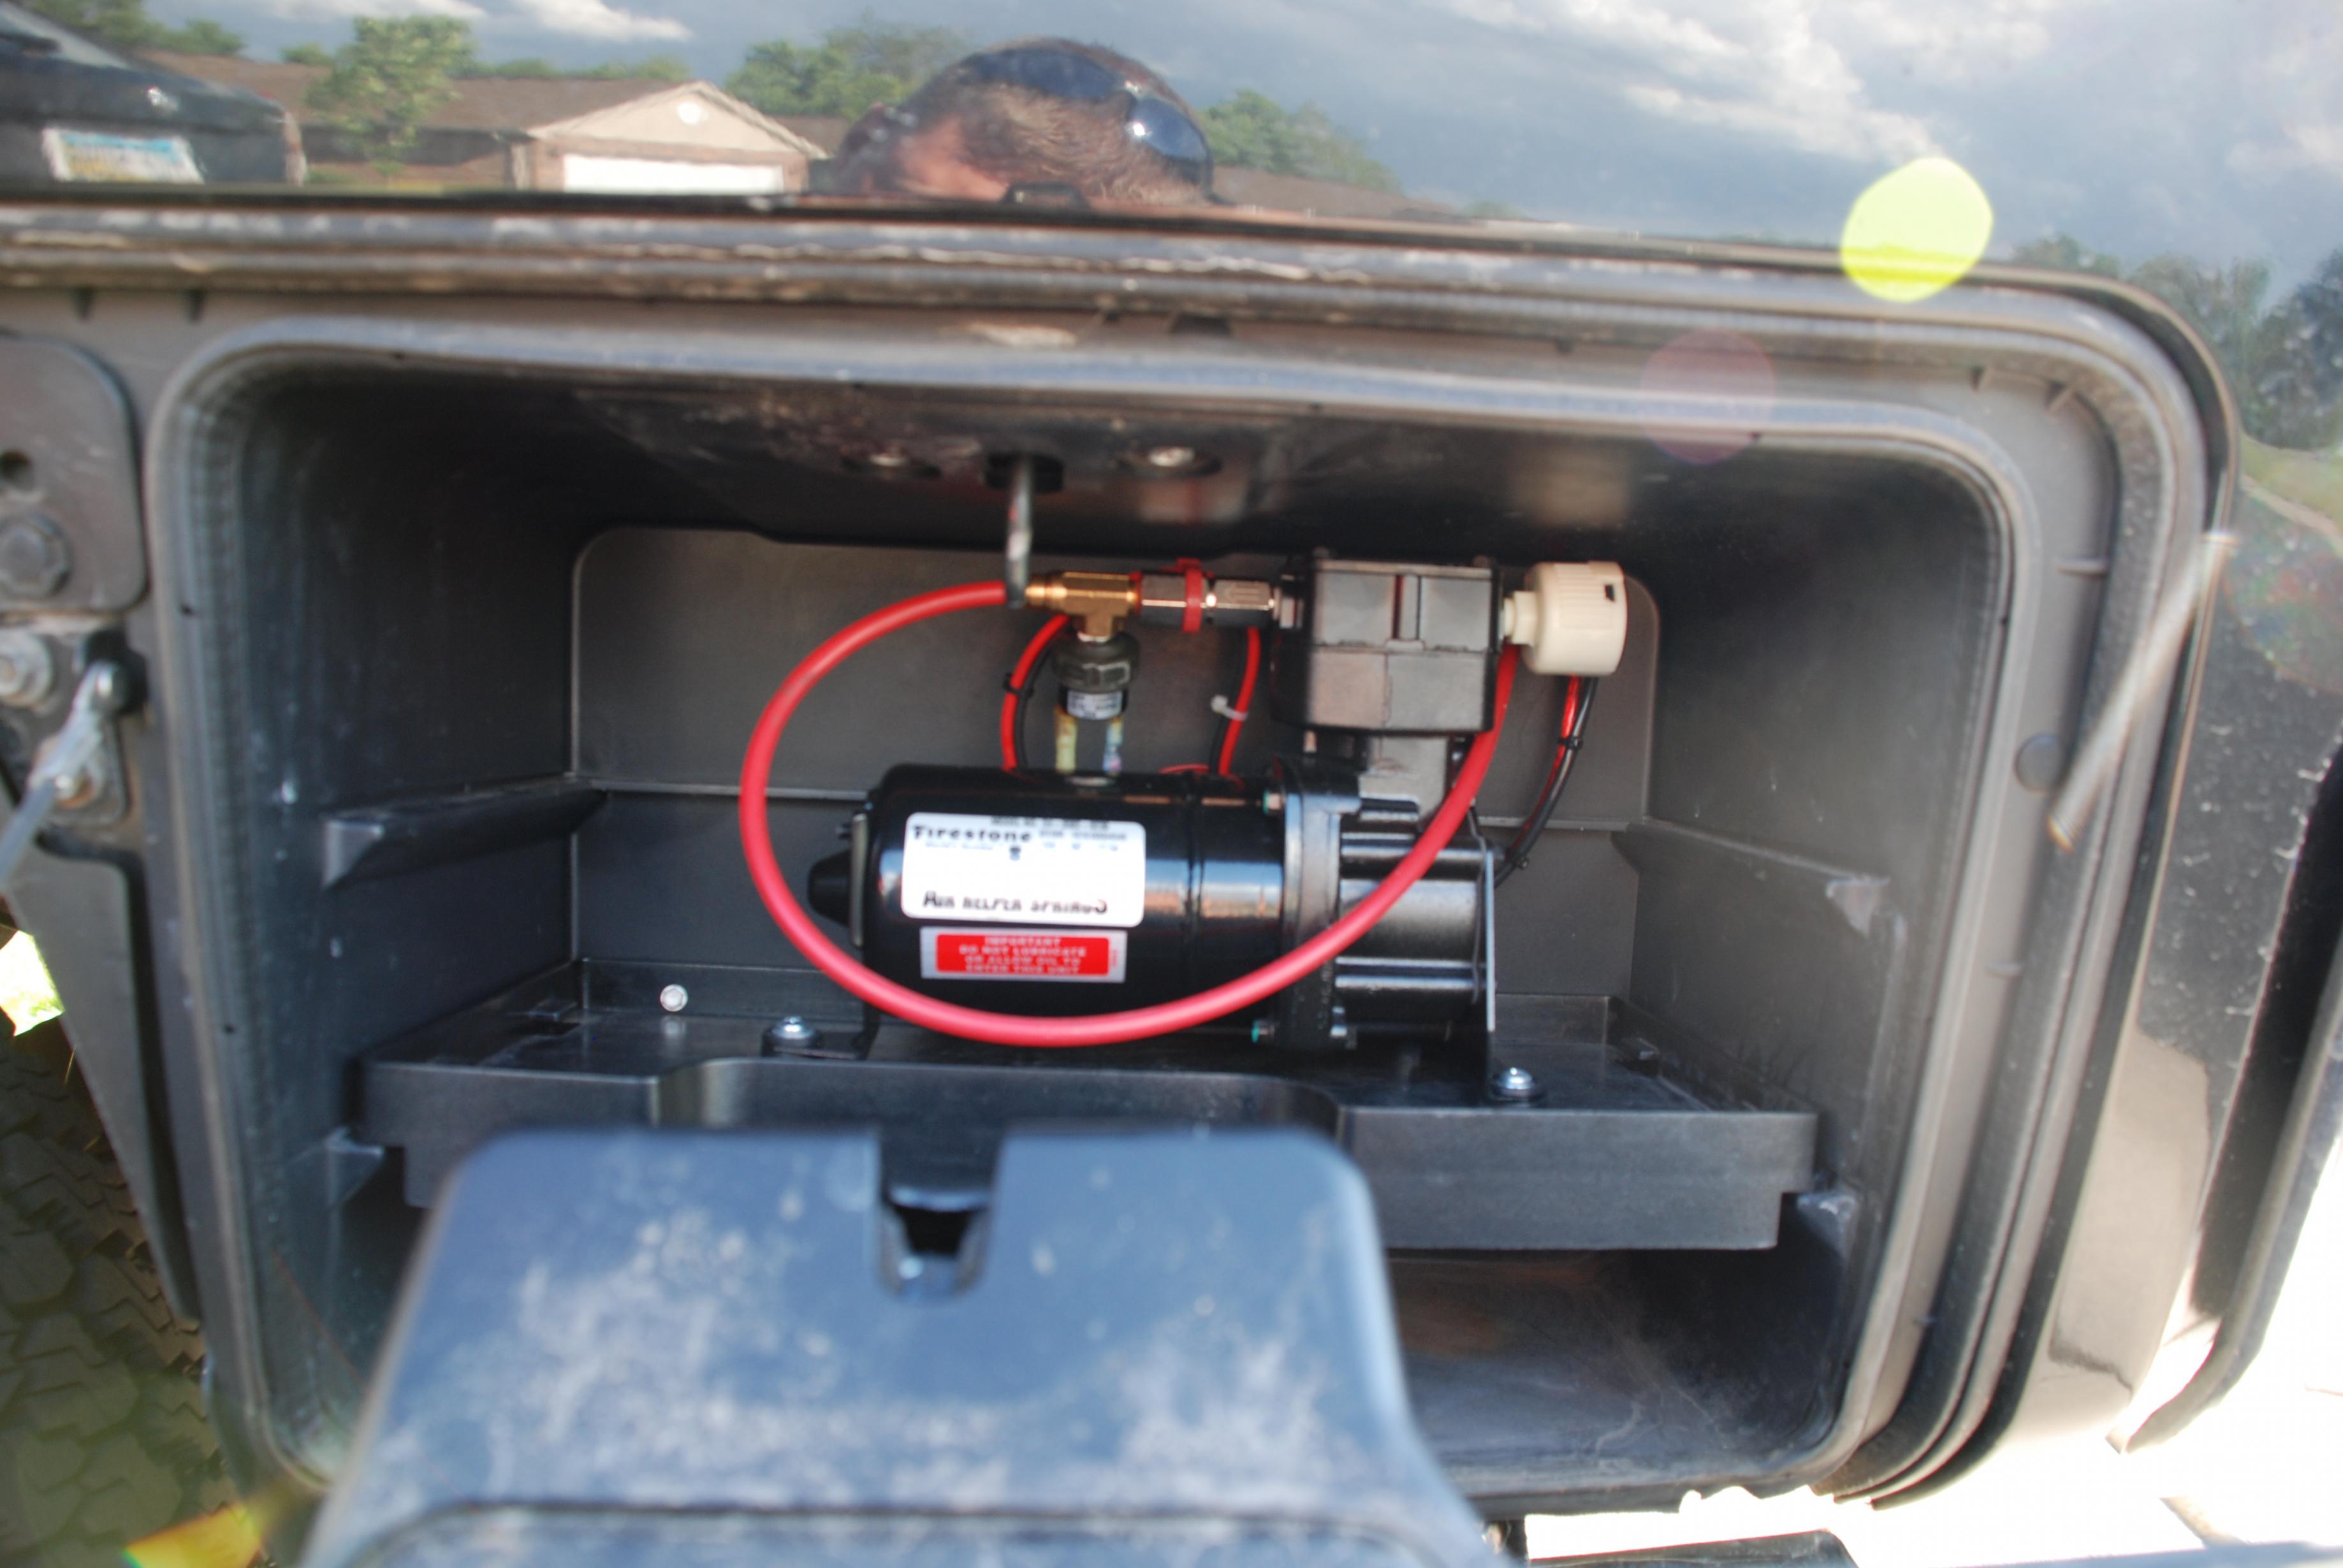 Airbag Onboard Air Installation Dsc 0131 Jpg